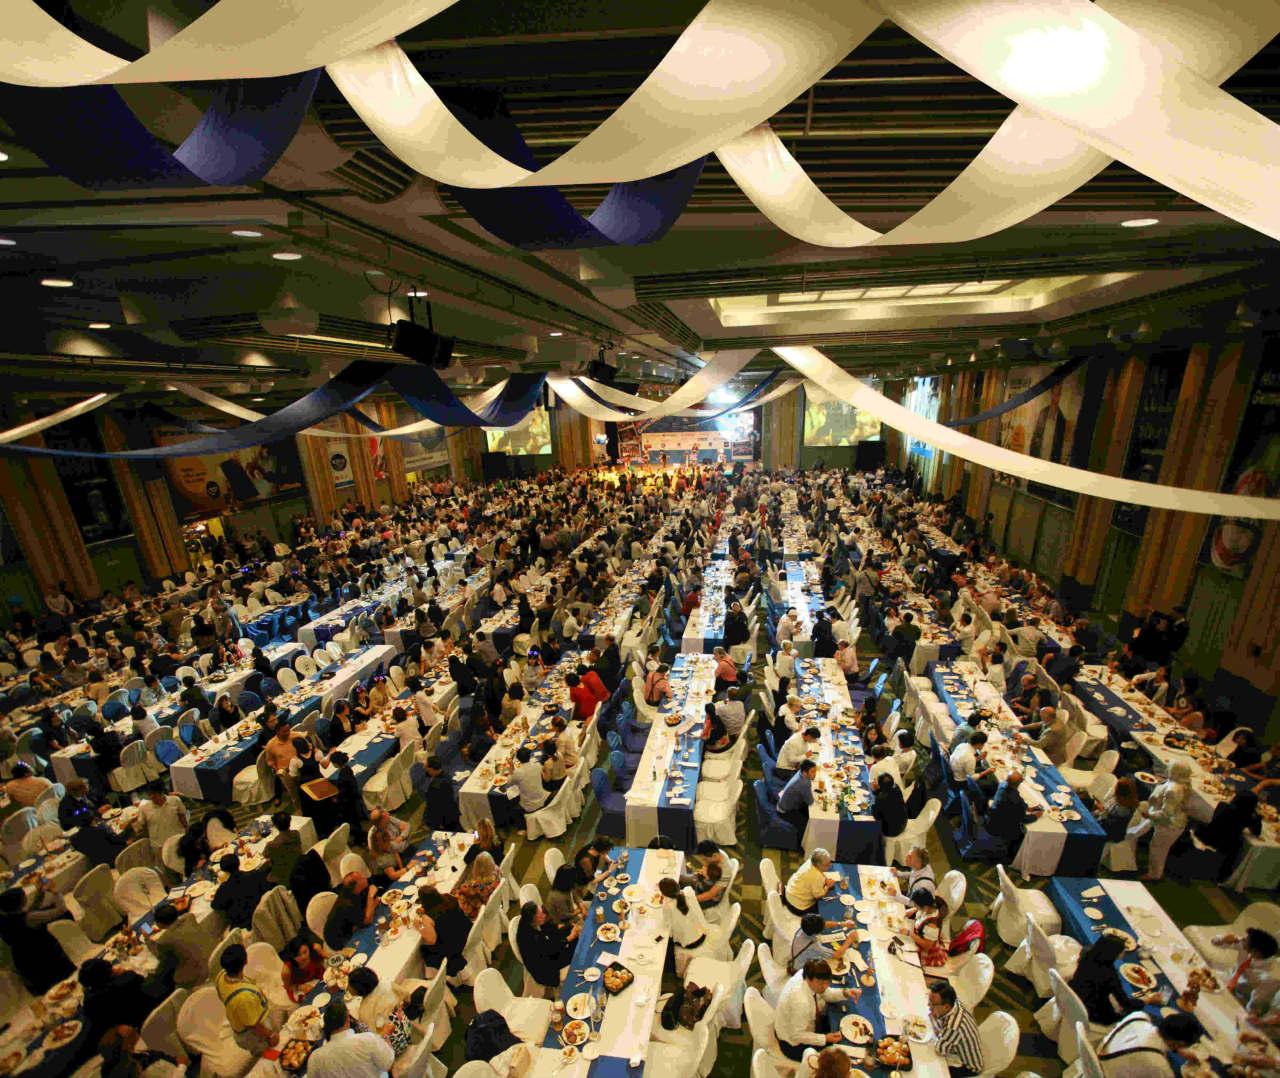 Grand Hilton Seoul Oktoberfest (Grand Hilton Seoul)